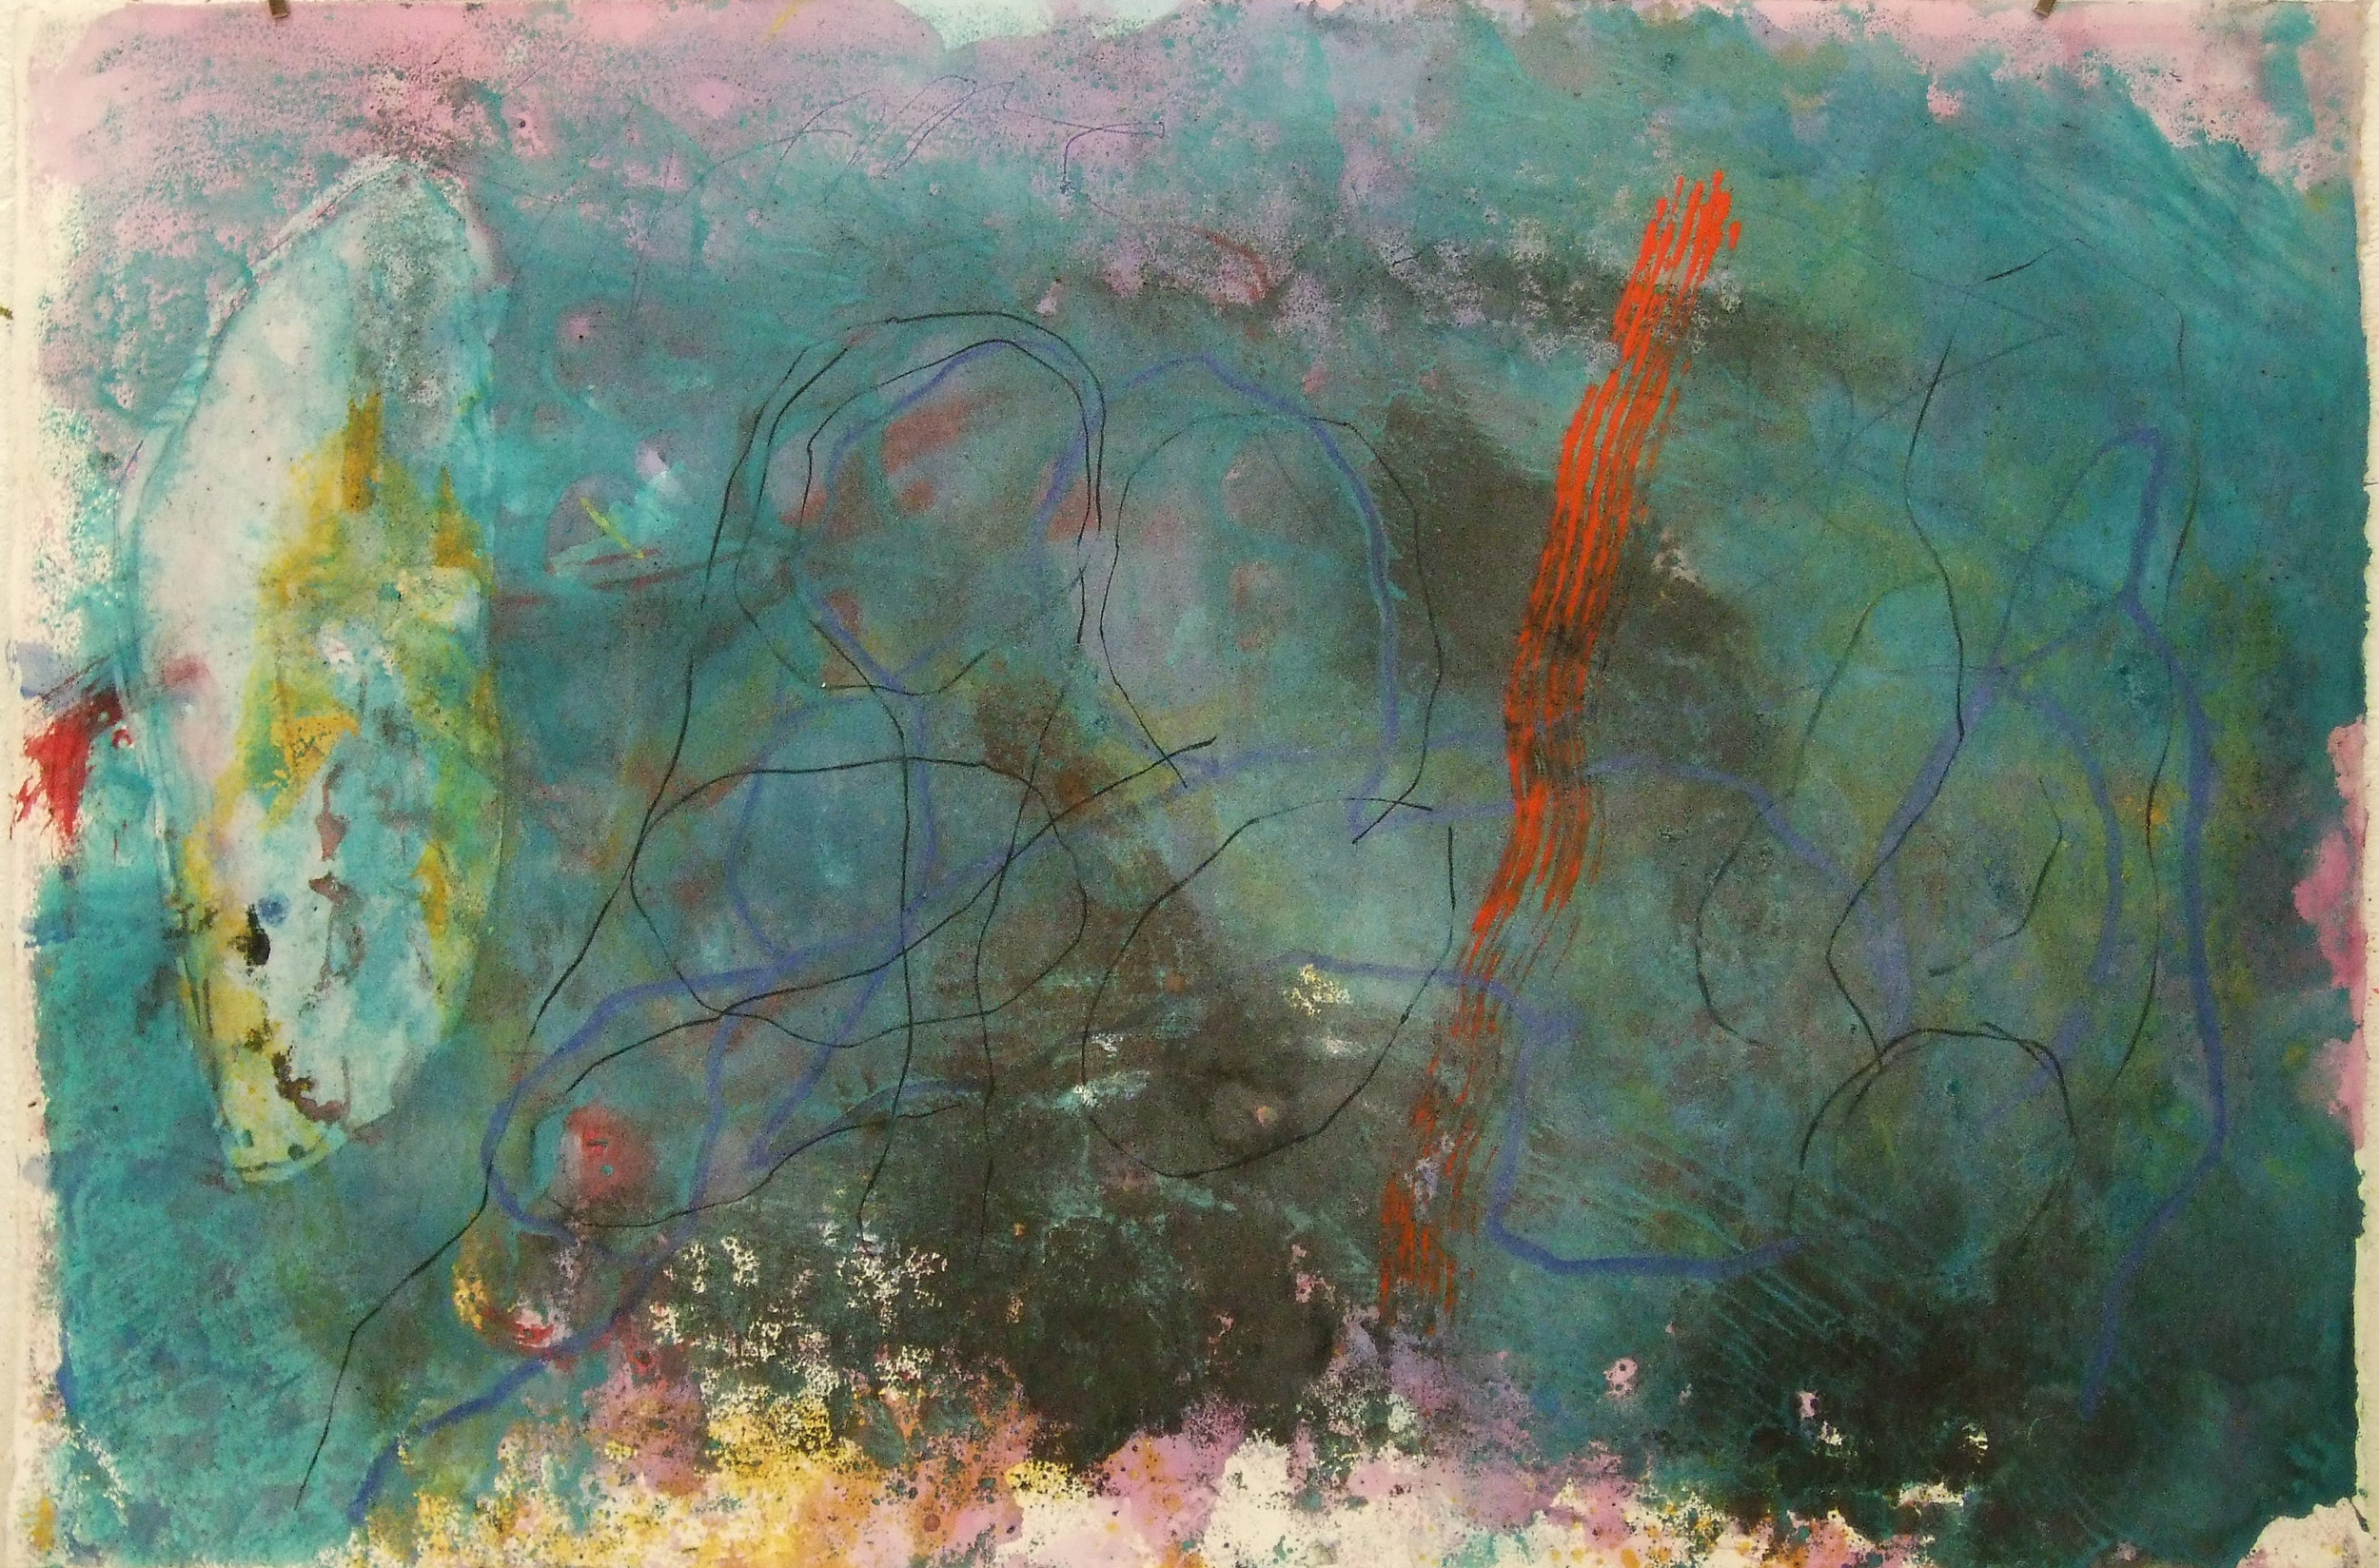 Sense títol  , pintura sobre paper Velin Arches, 198 x 28 centímetres. 2010